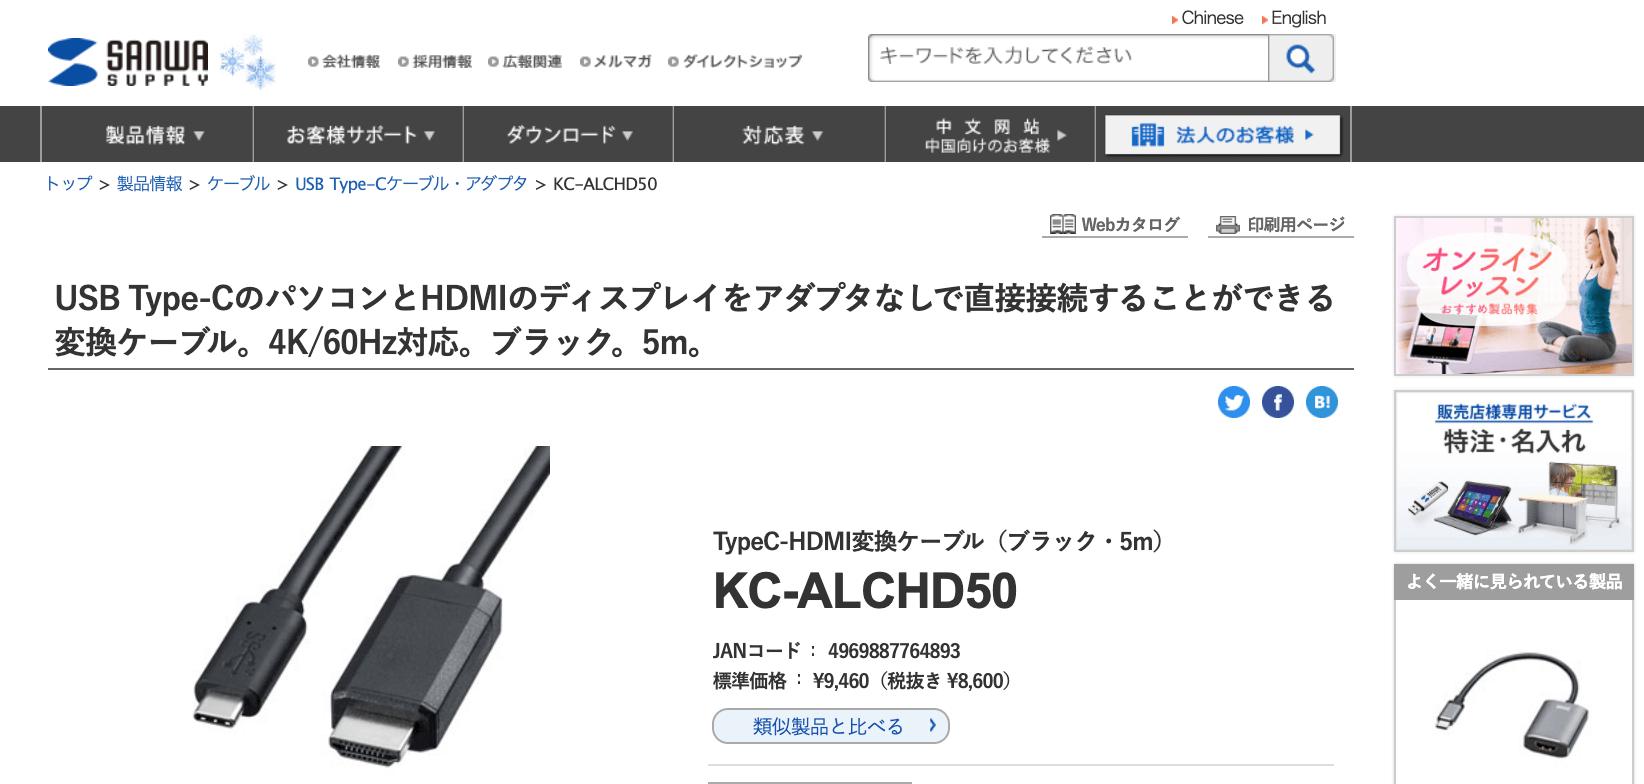 TypeC-HDMI変換ケーブル KC-ALCHD50